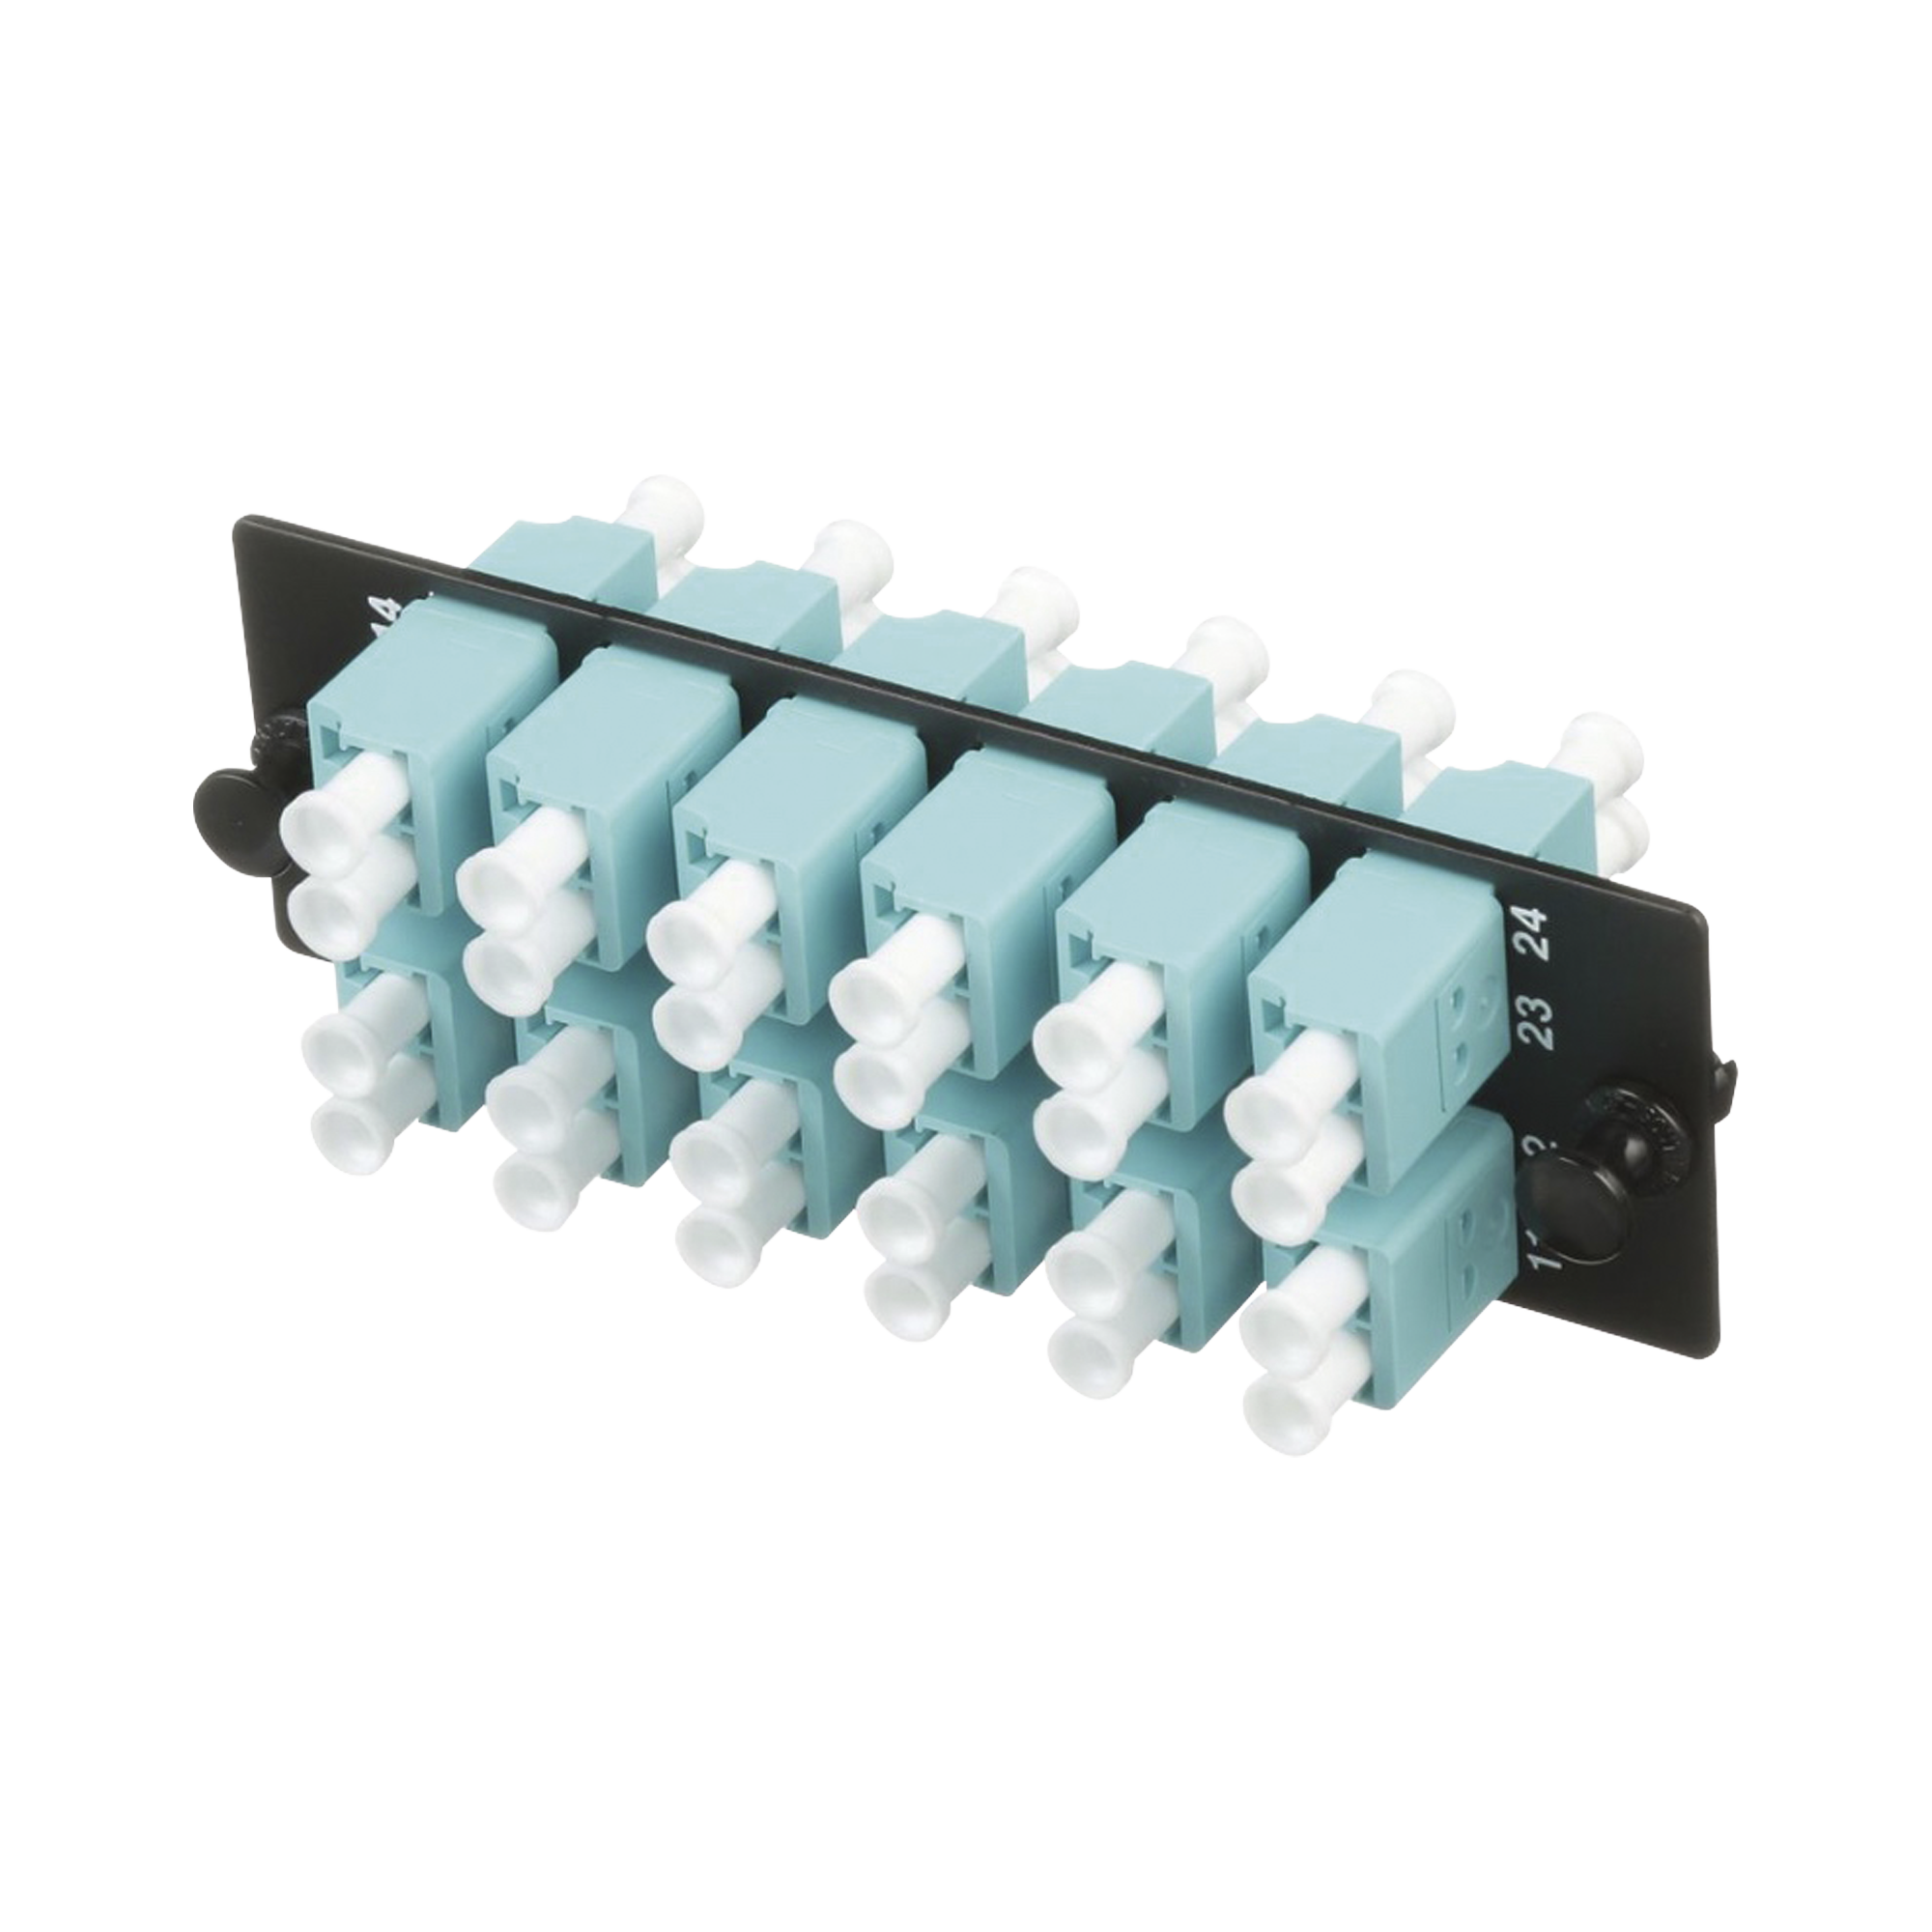 Placa Acopladora de Fibra Optica FAP, Con 12 Conectores LC Duplex (24 Fibras), Para Fibra Multimodo OM3/OM4, Color Aqua